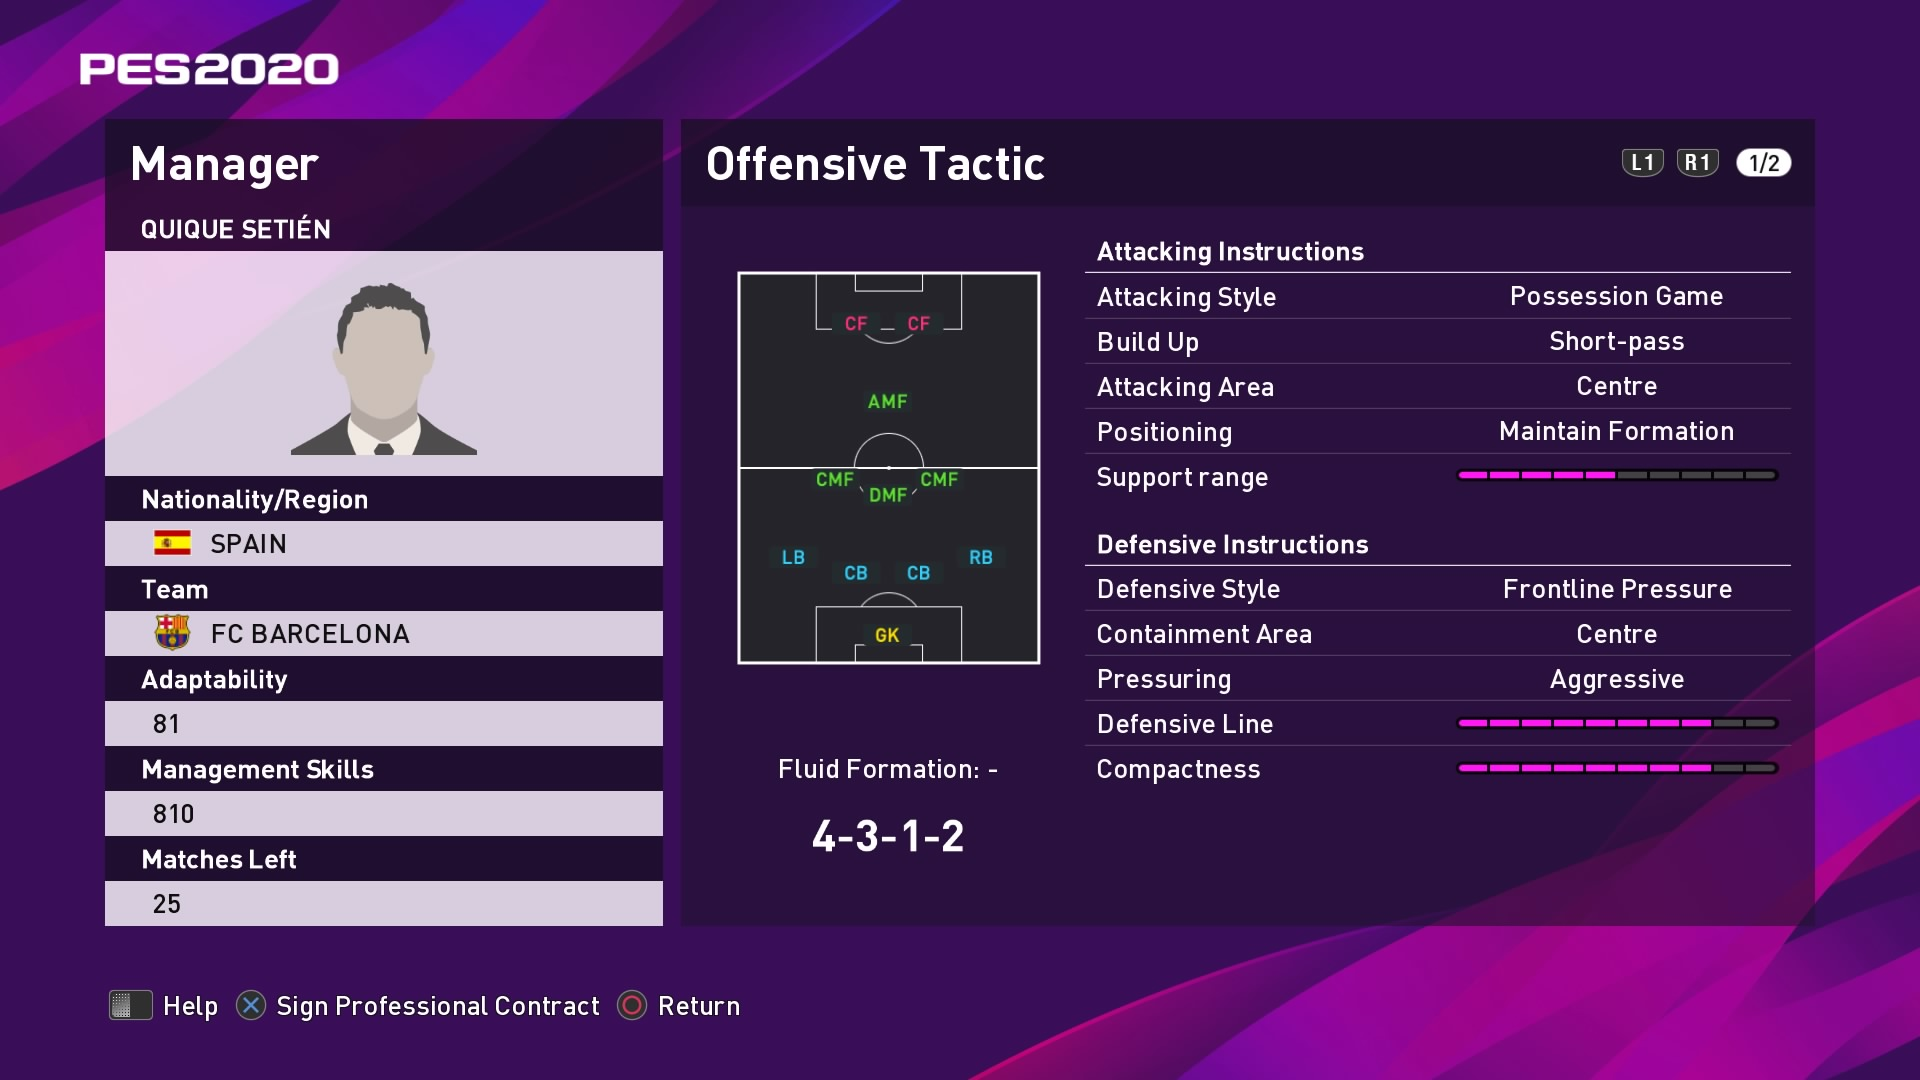 Quique Setién Offensive Tactic in PES 2020 myClub